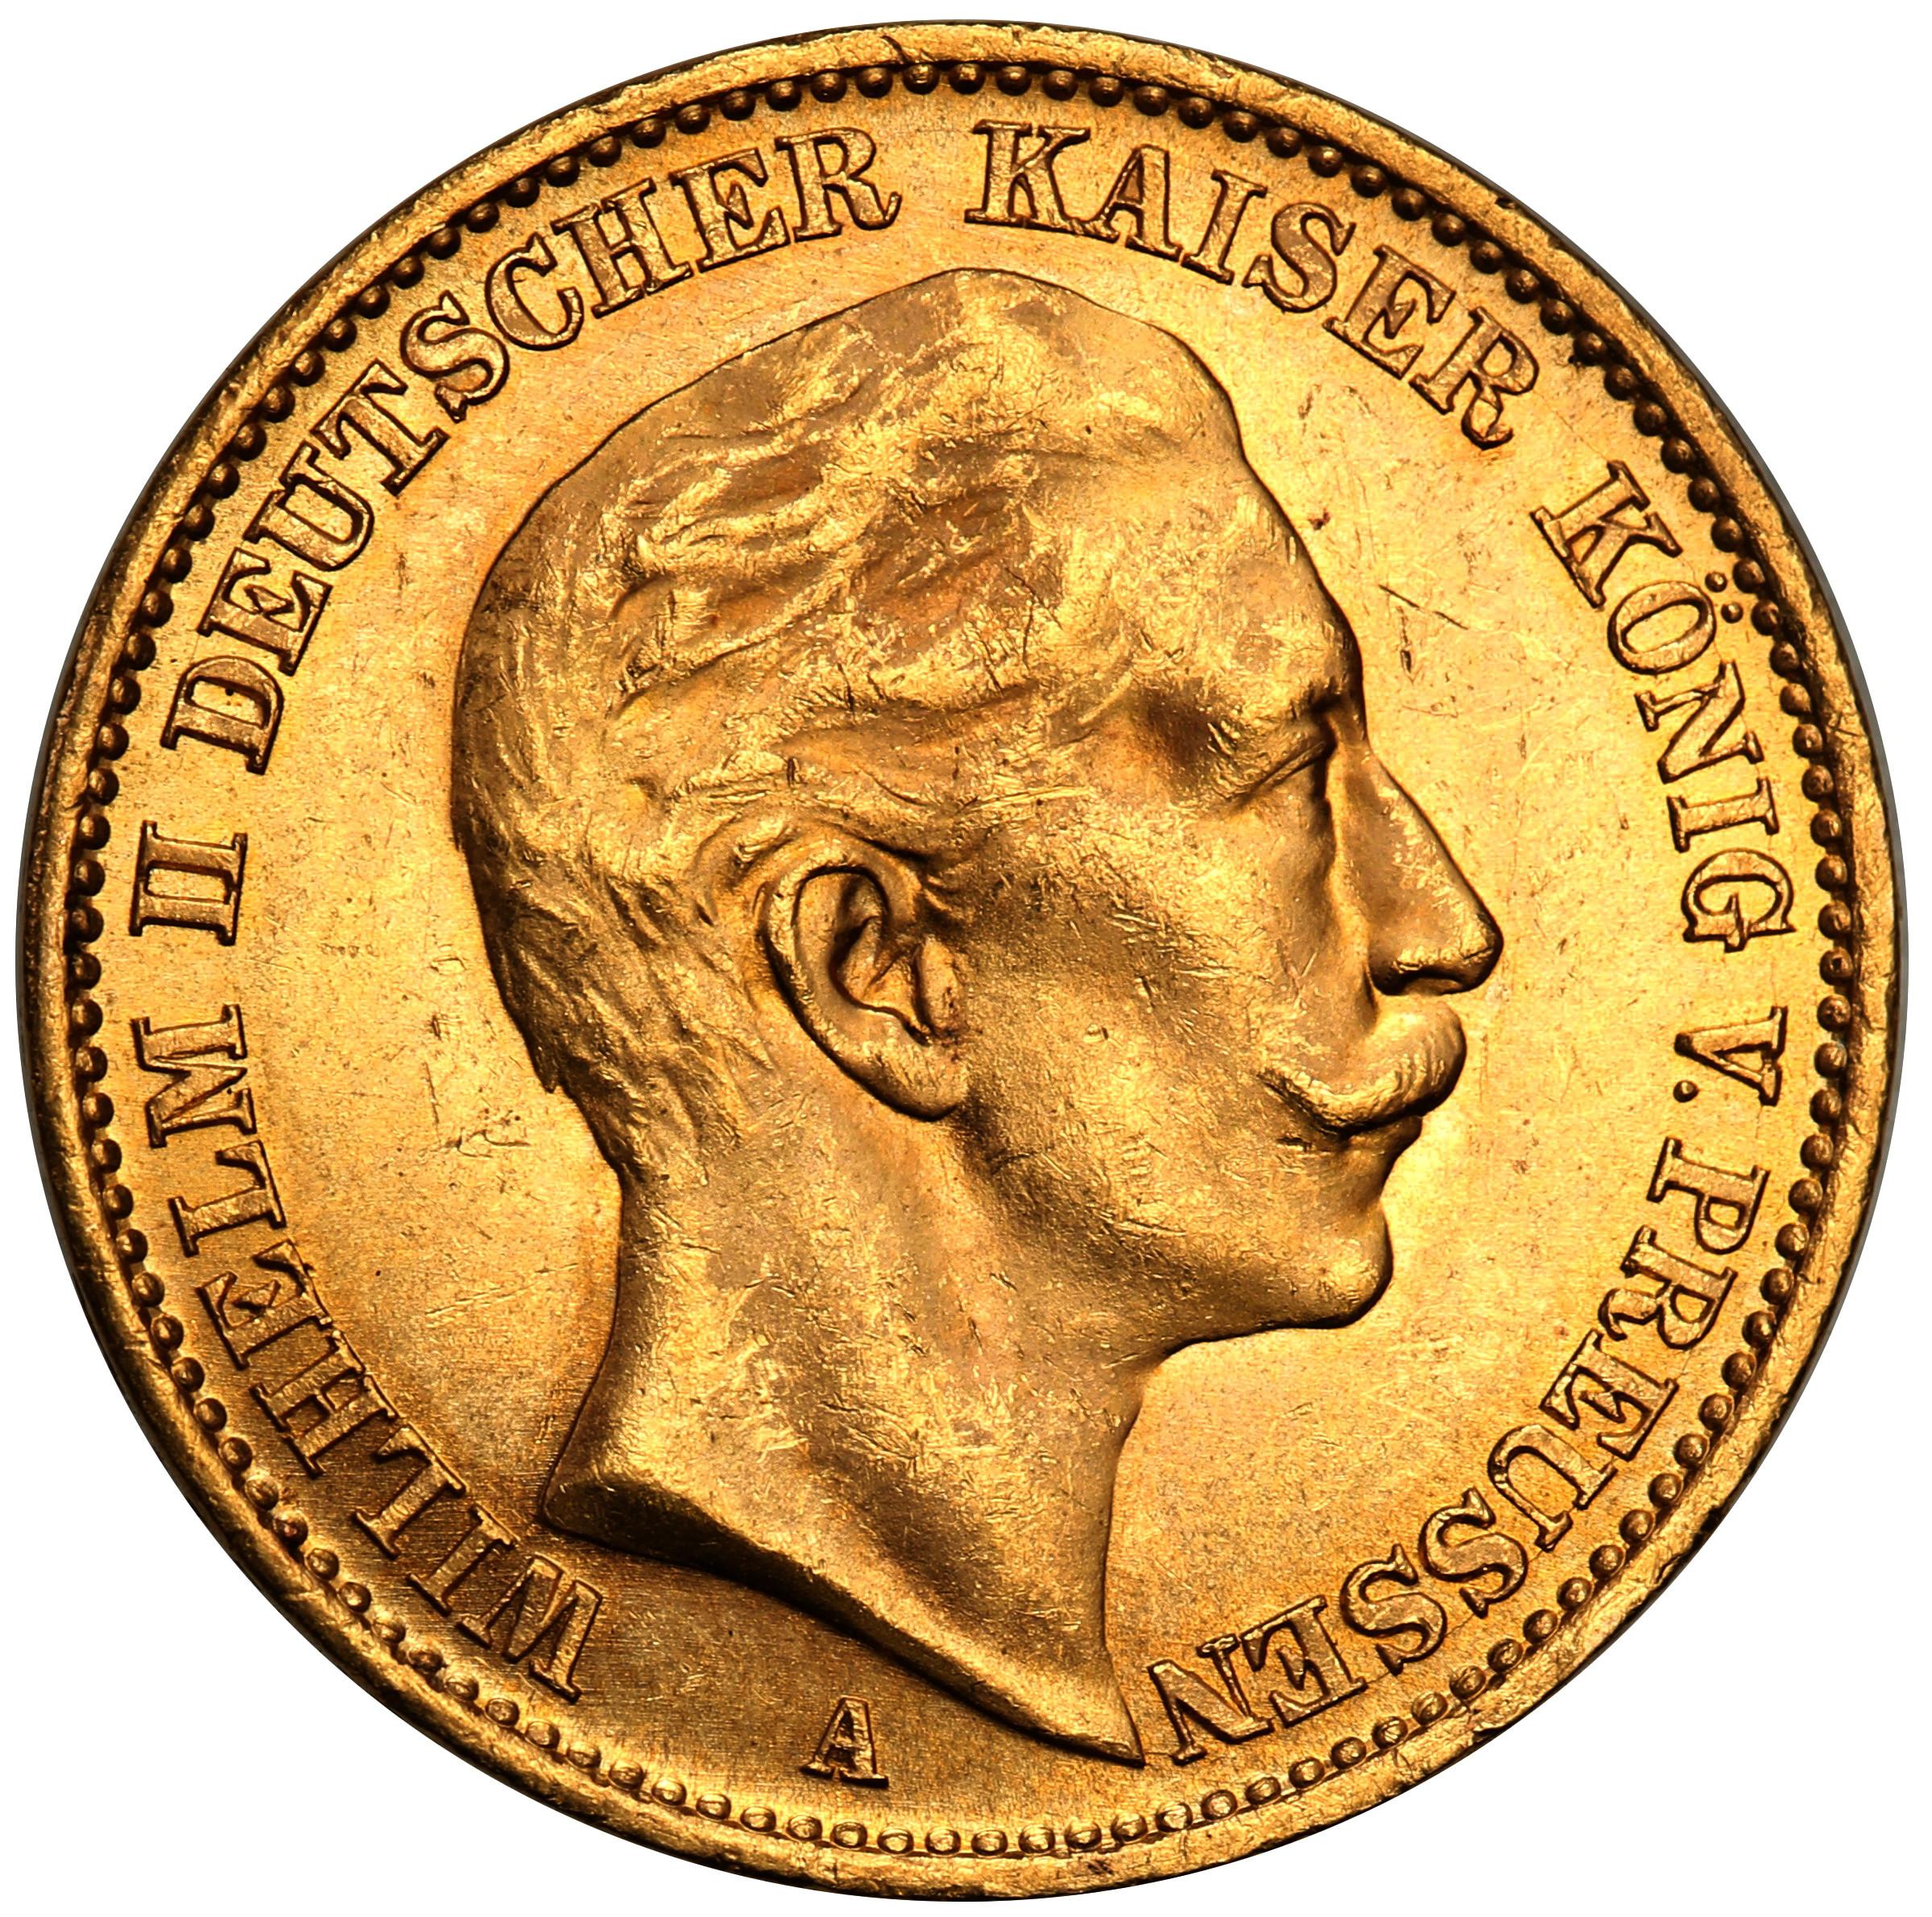 Niemcy Prusy. 20 Marek 1912 A st.1 PIĘKNE